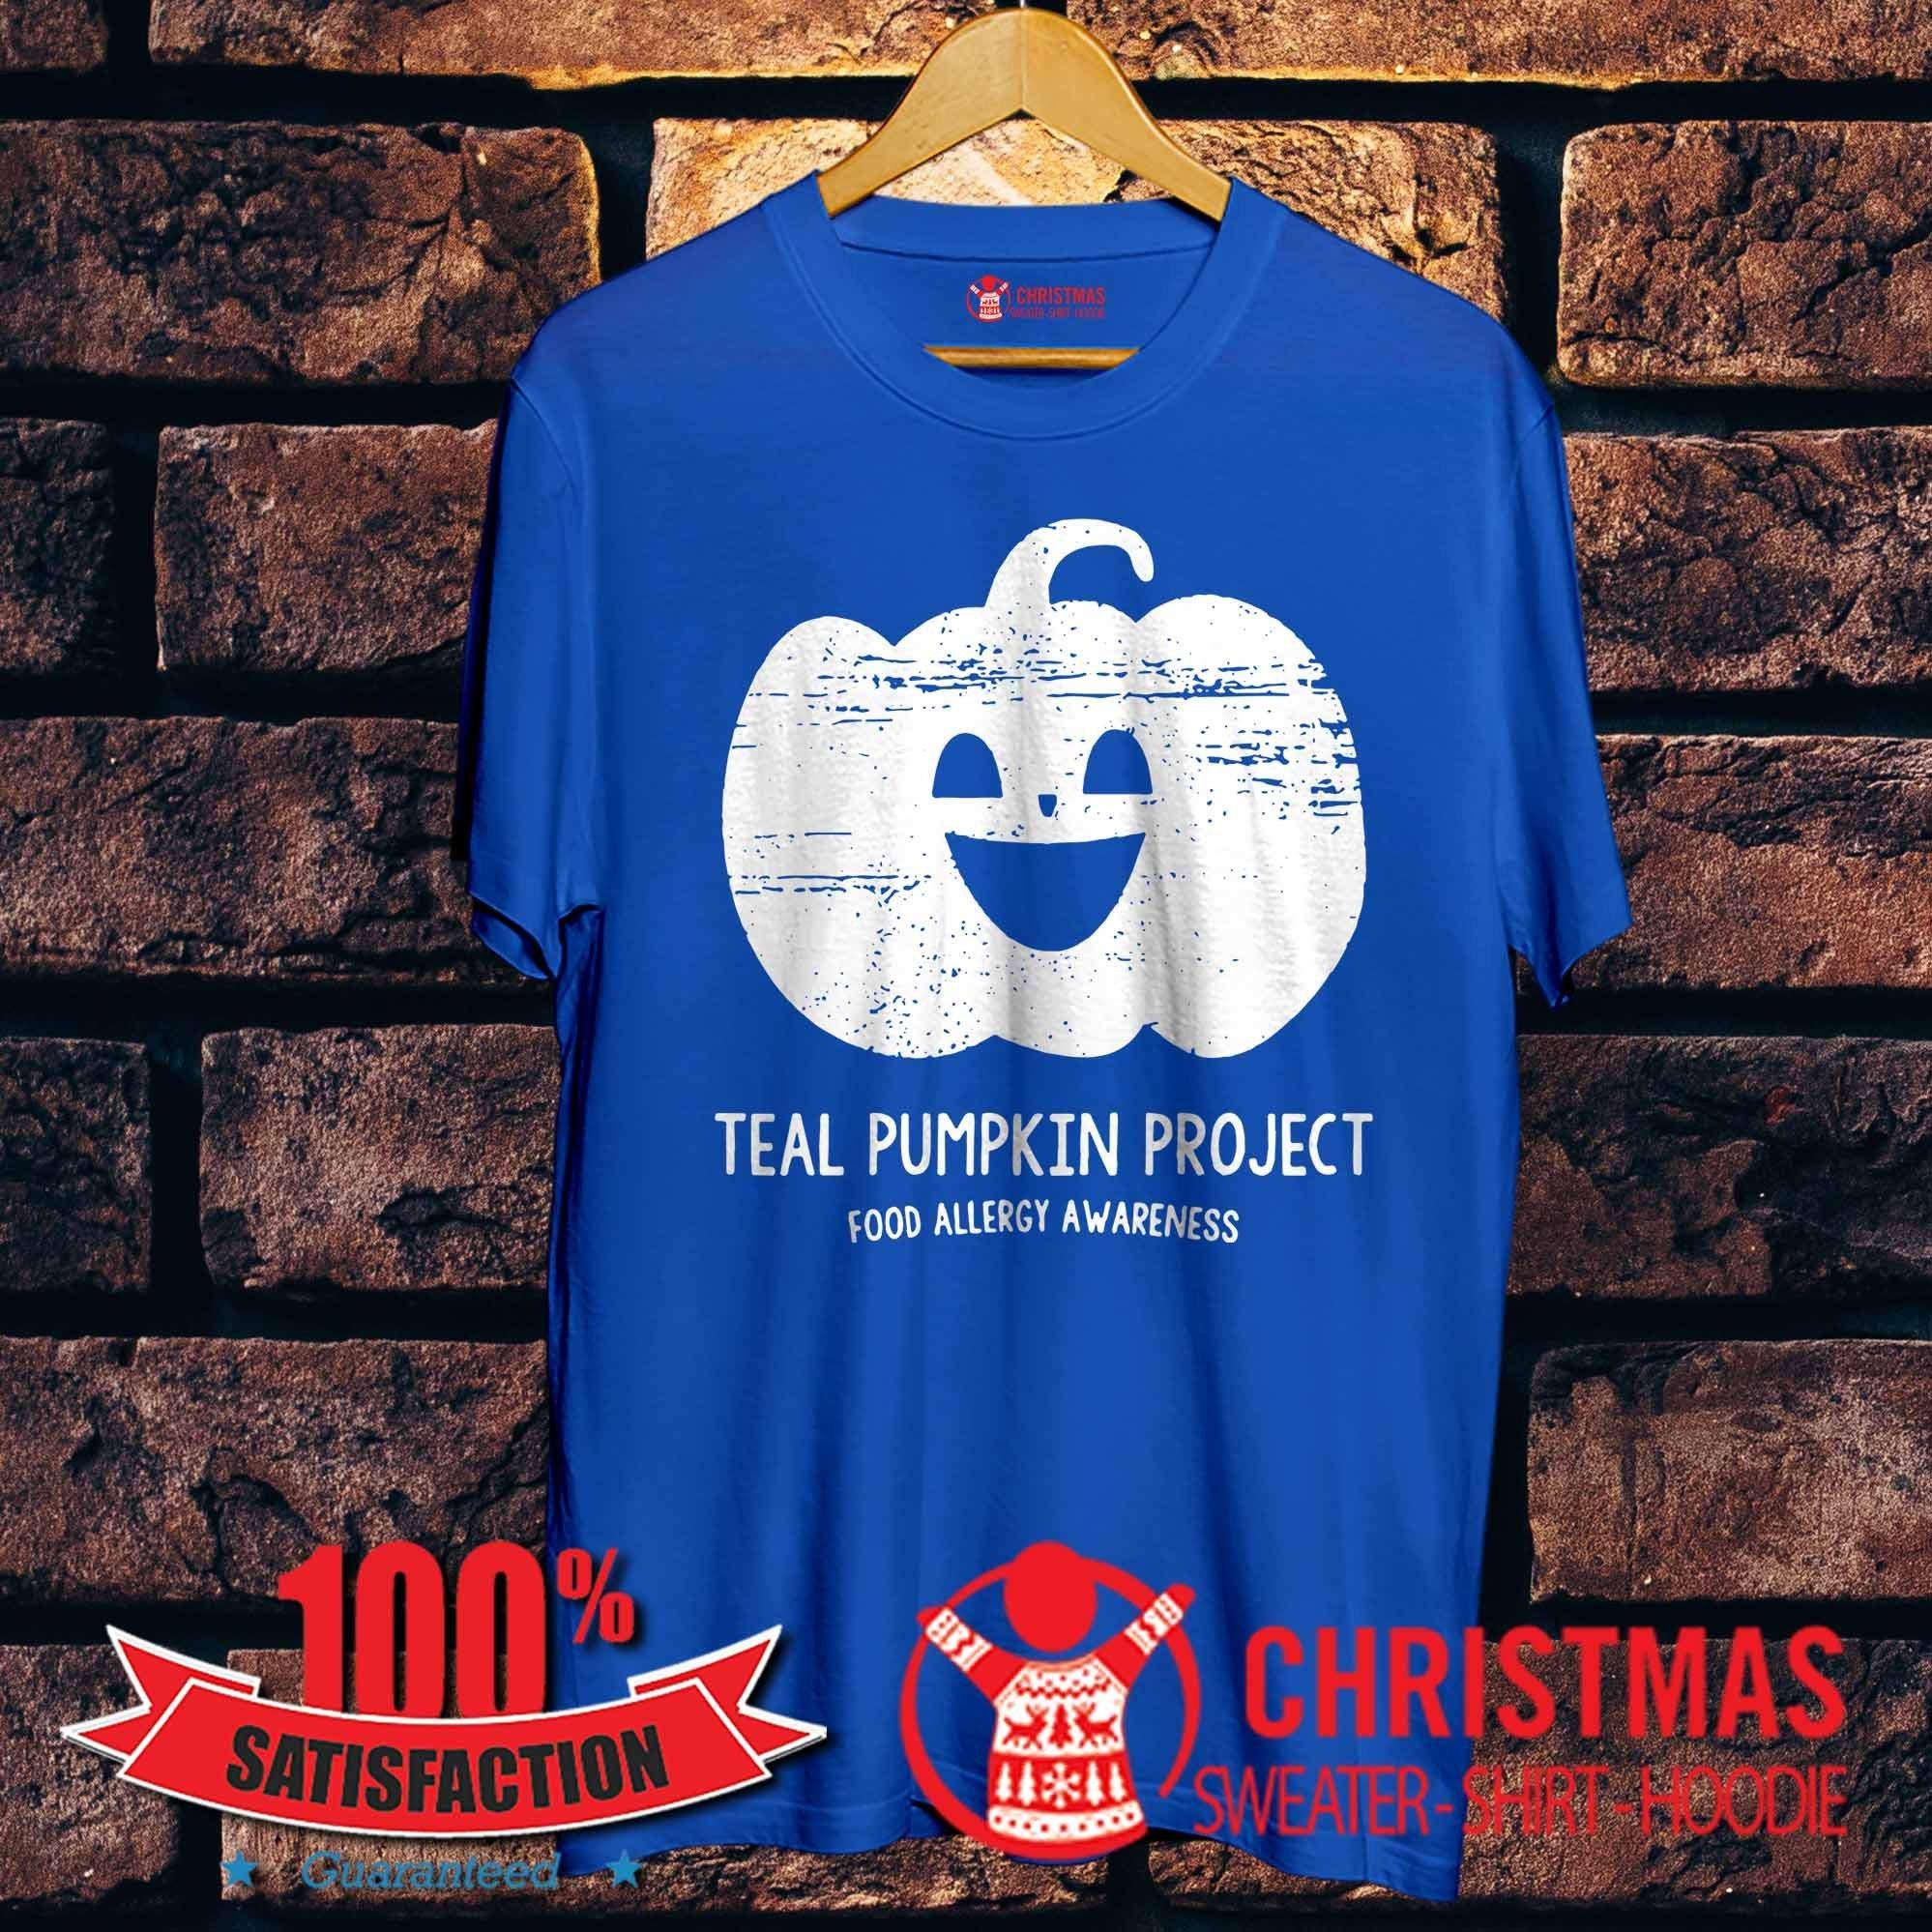 Teal Pumpkin Project food allergy awareness shirt